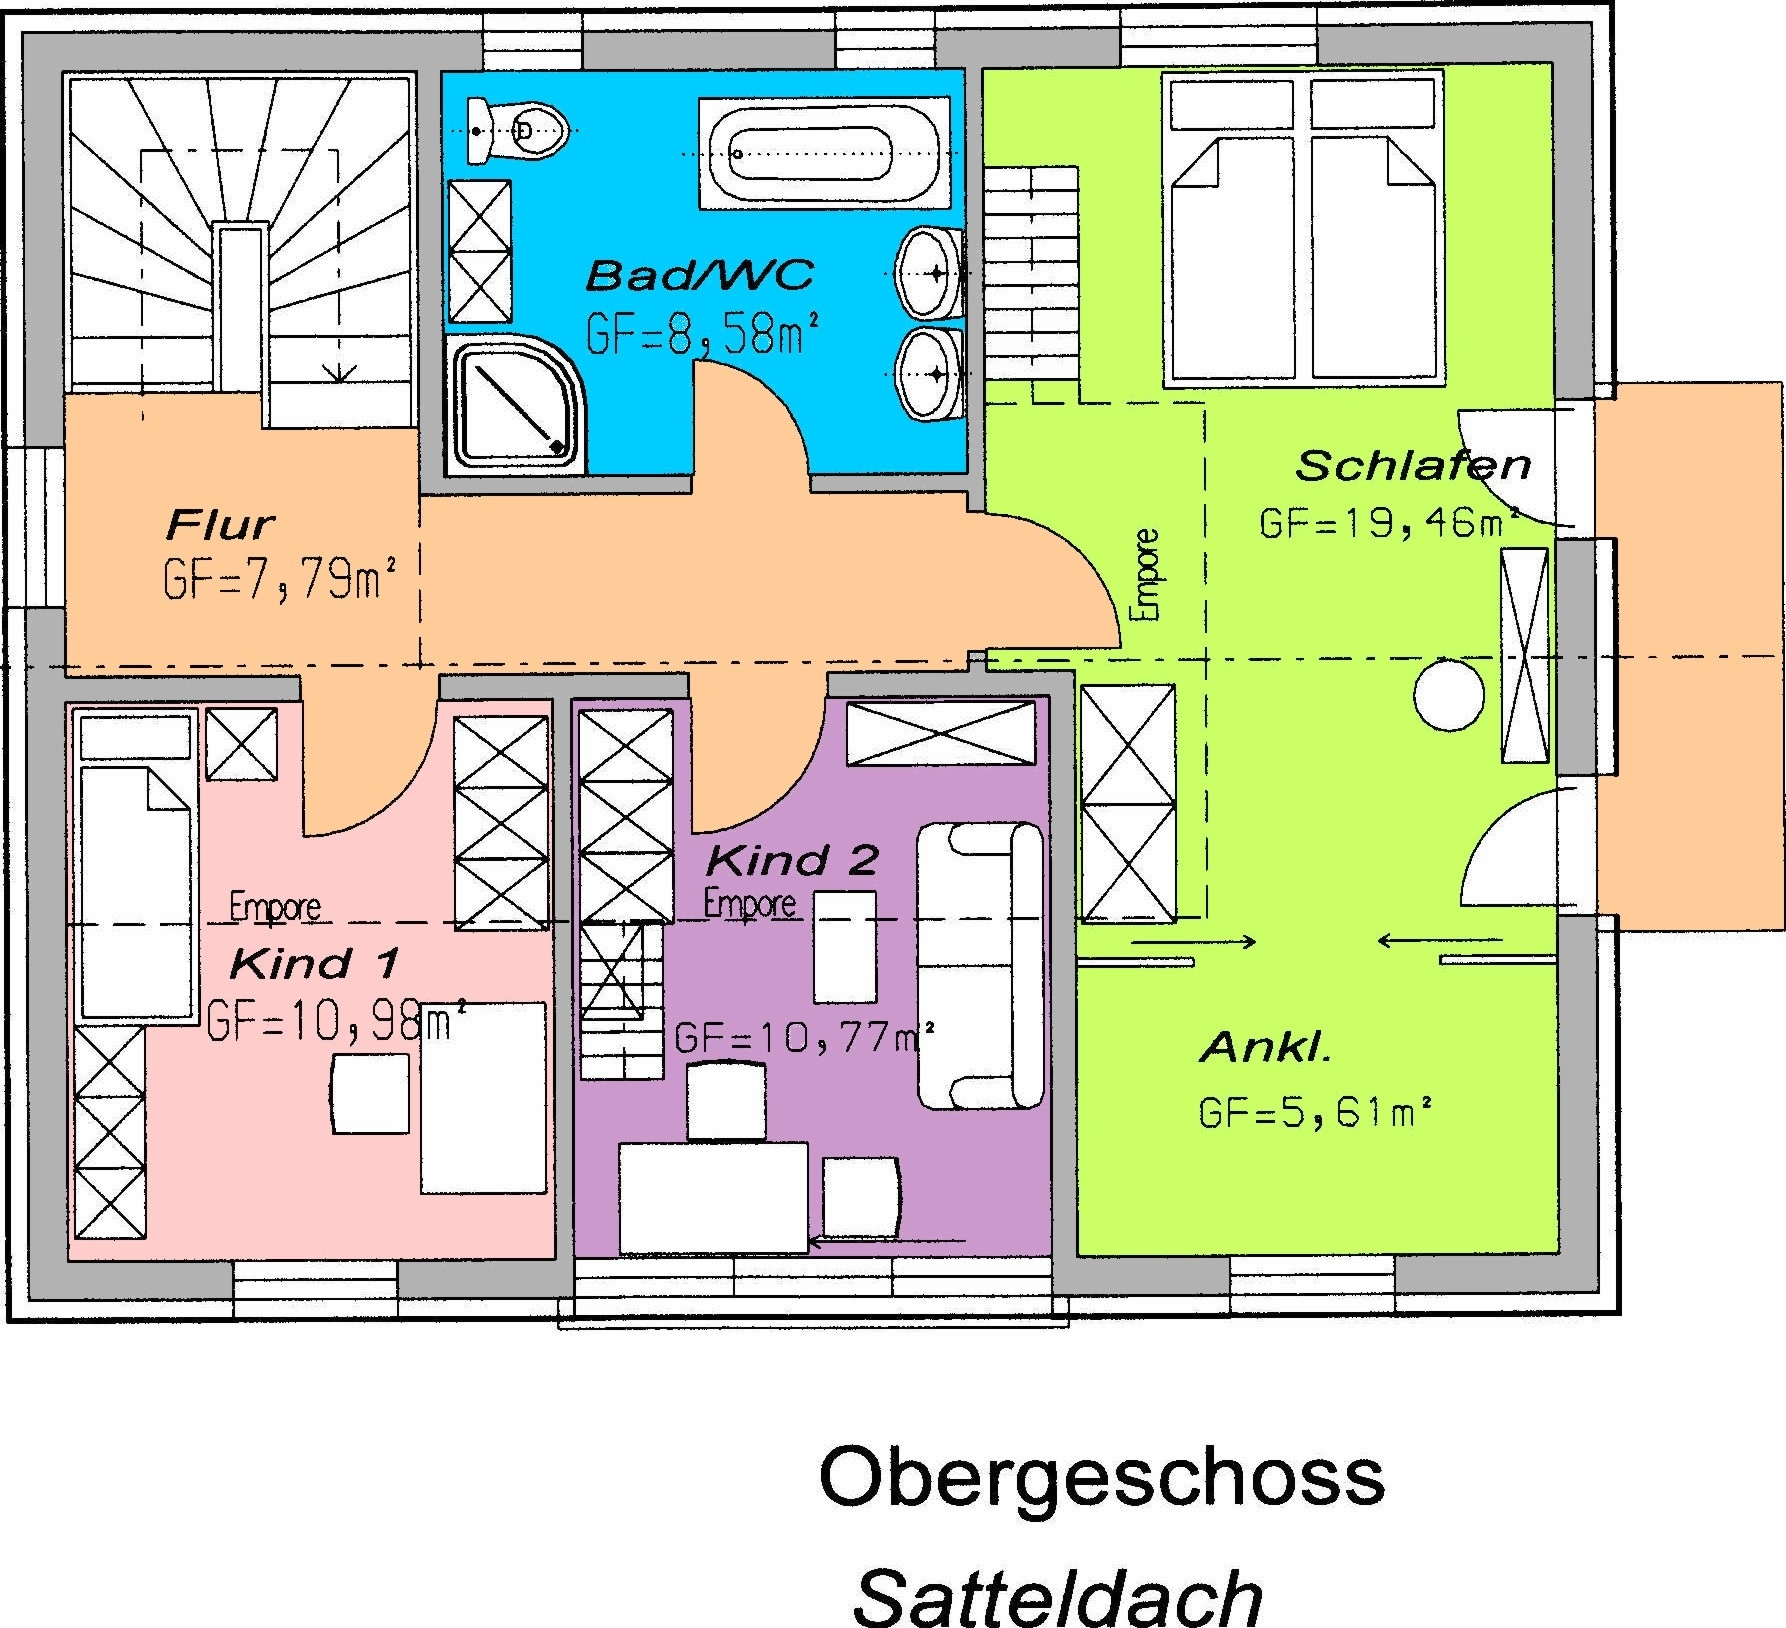 Grobios Grundriss OG Satteldach  Bauplanung Grosch size: 1786 x 1628 post ID: 9 File size: 0 B